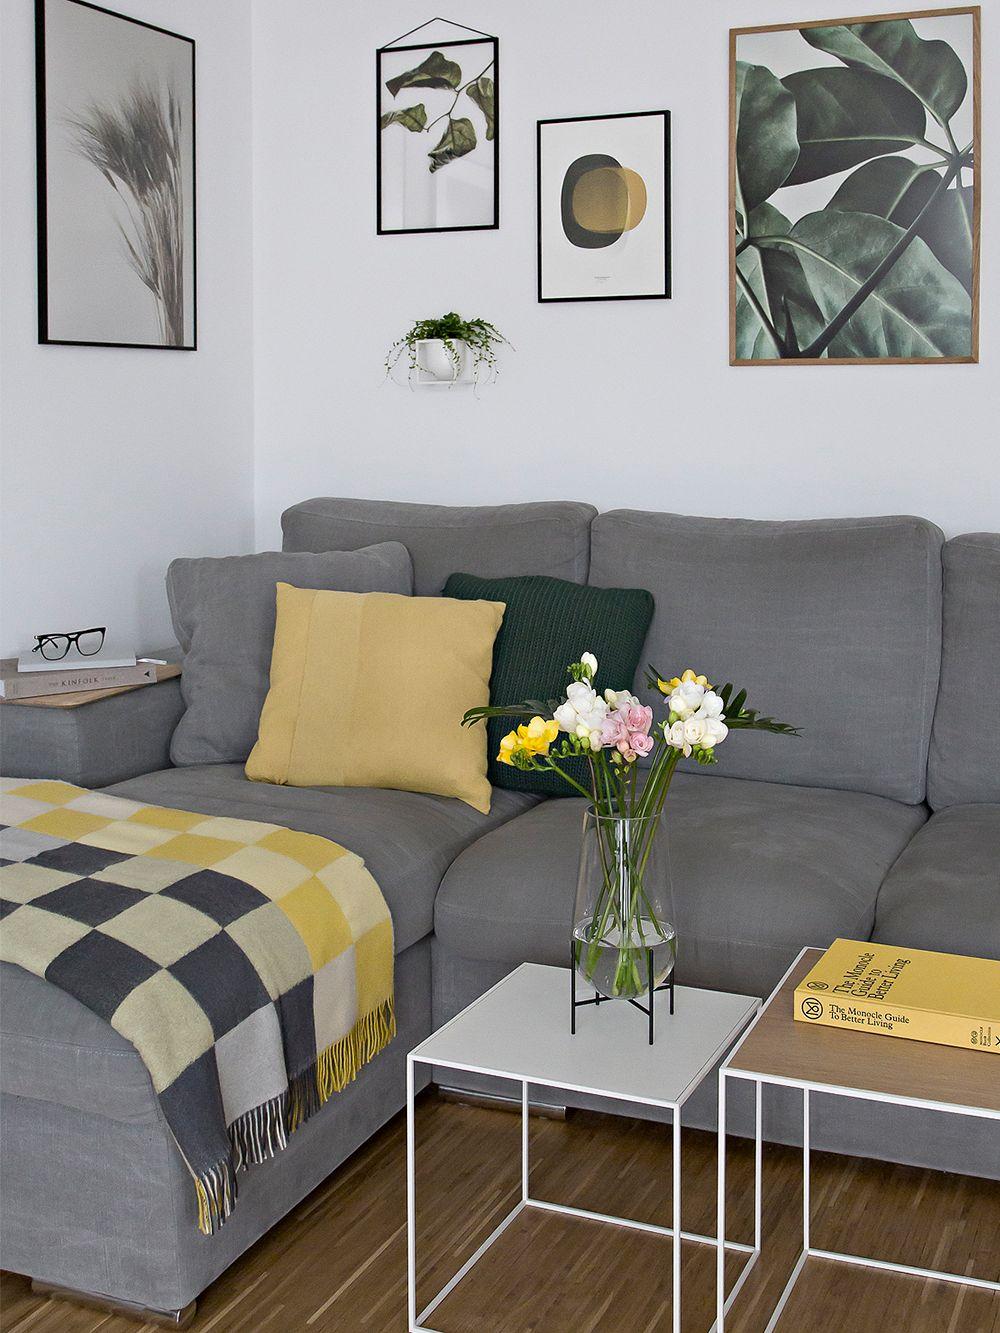 The yellow Layer cushion by Muuto